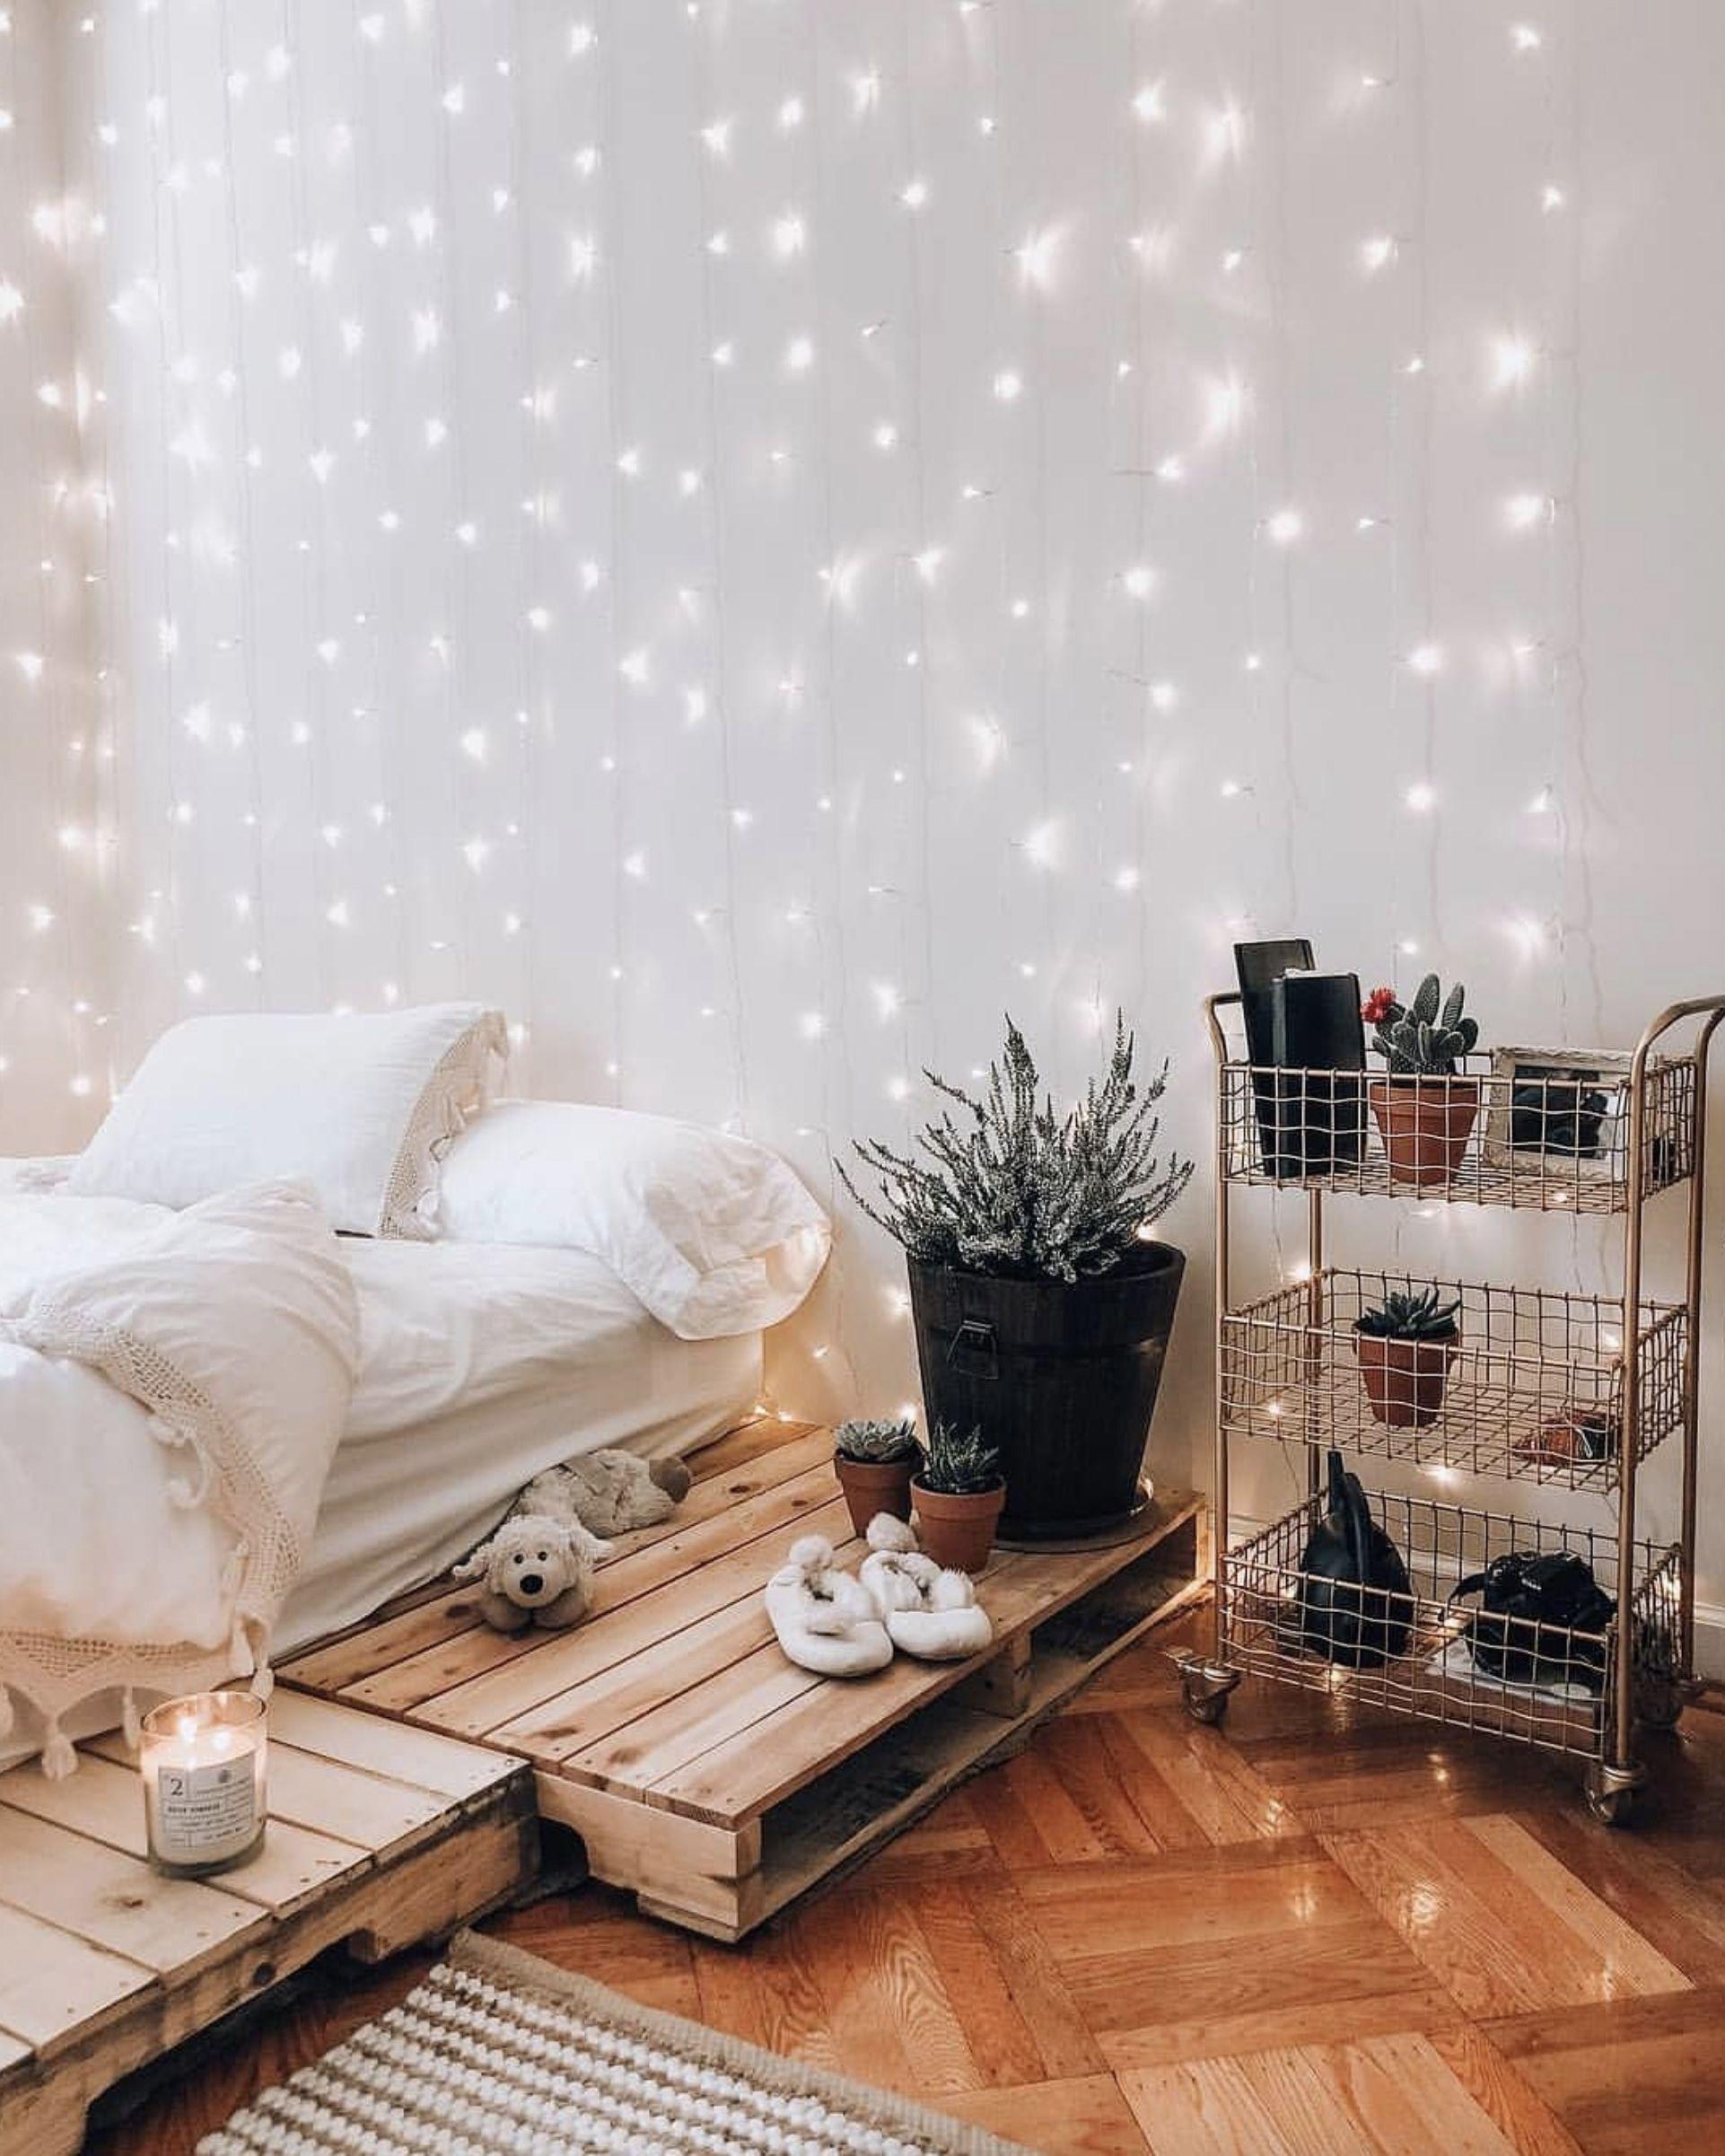 Dreamy and cozy bedroom inspo   Small room bedroom, Bedroom decor ...